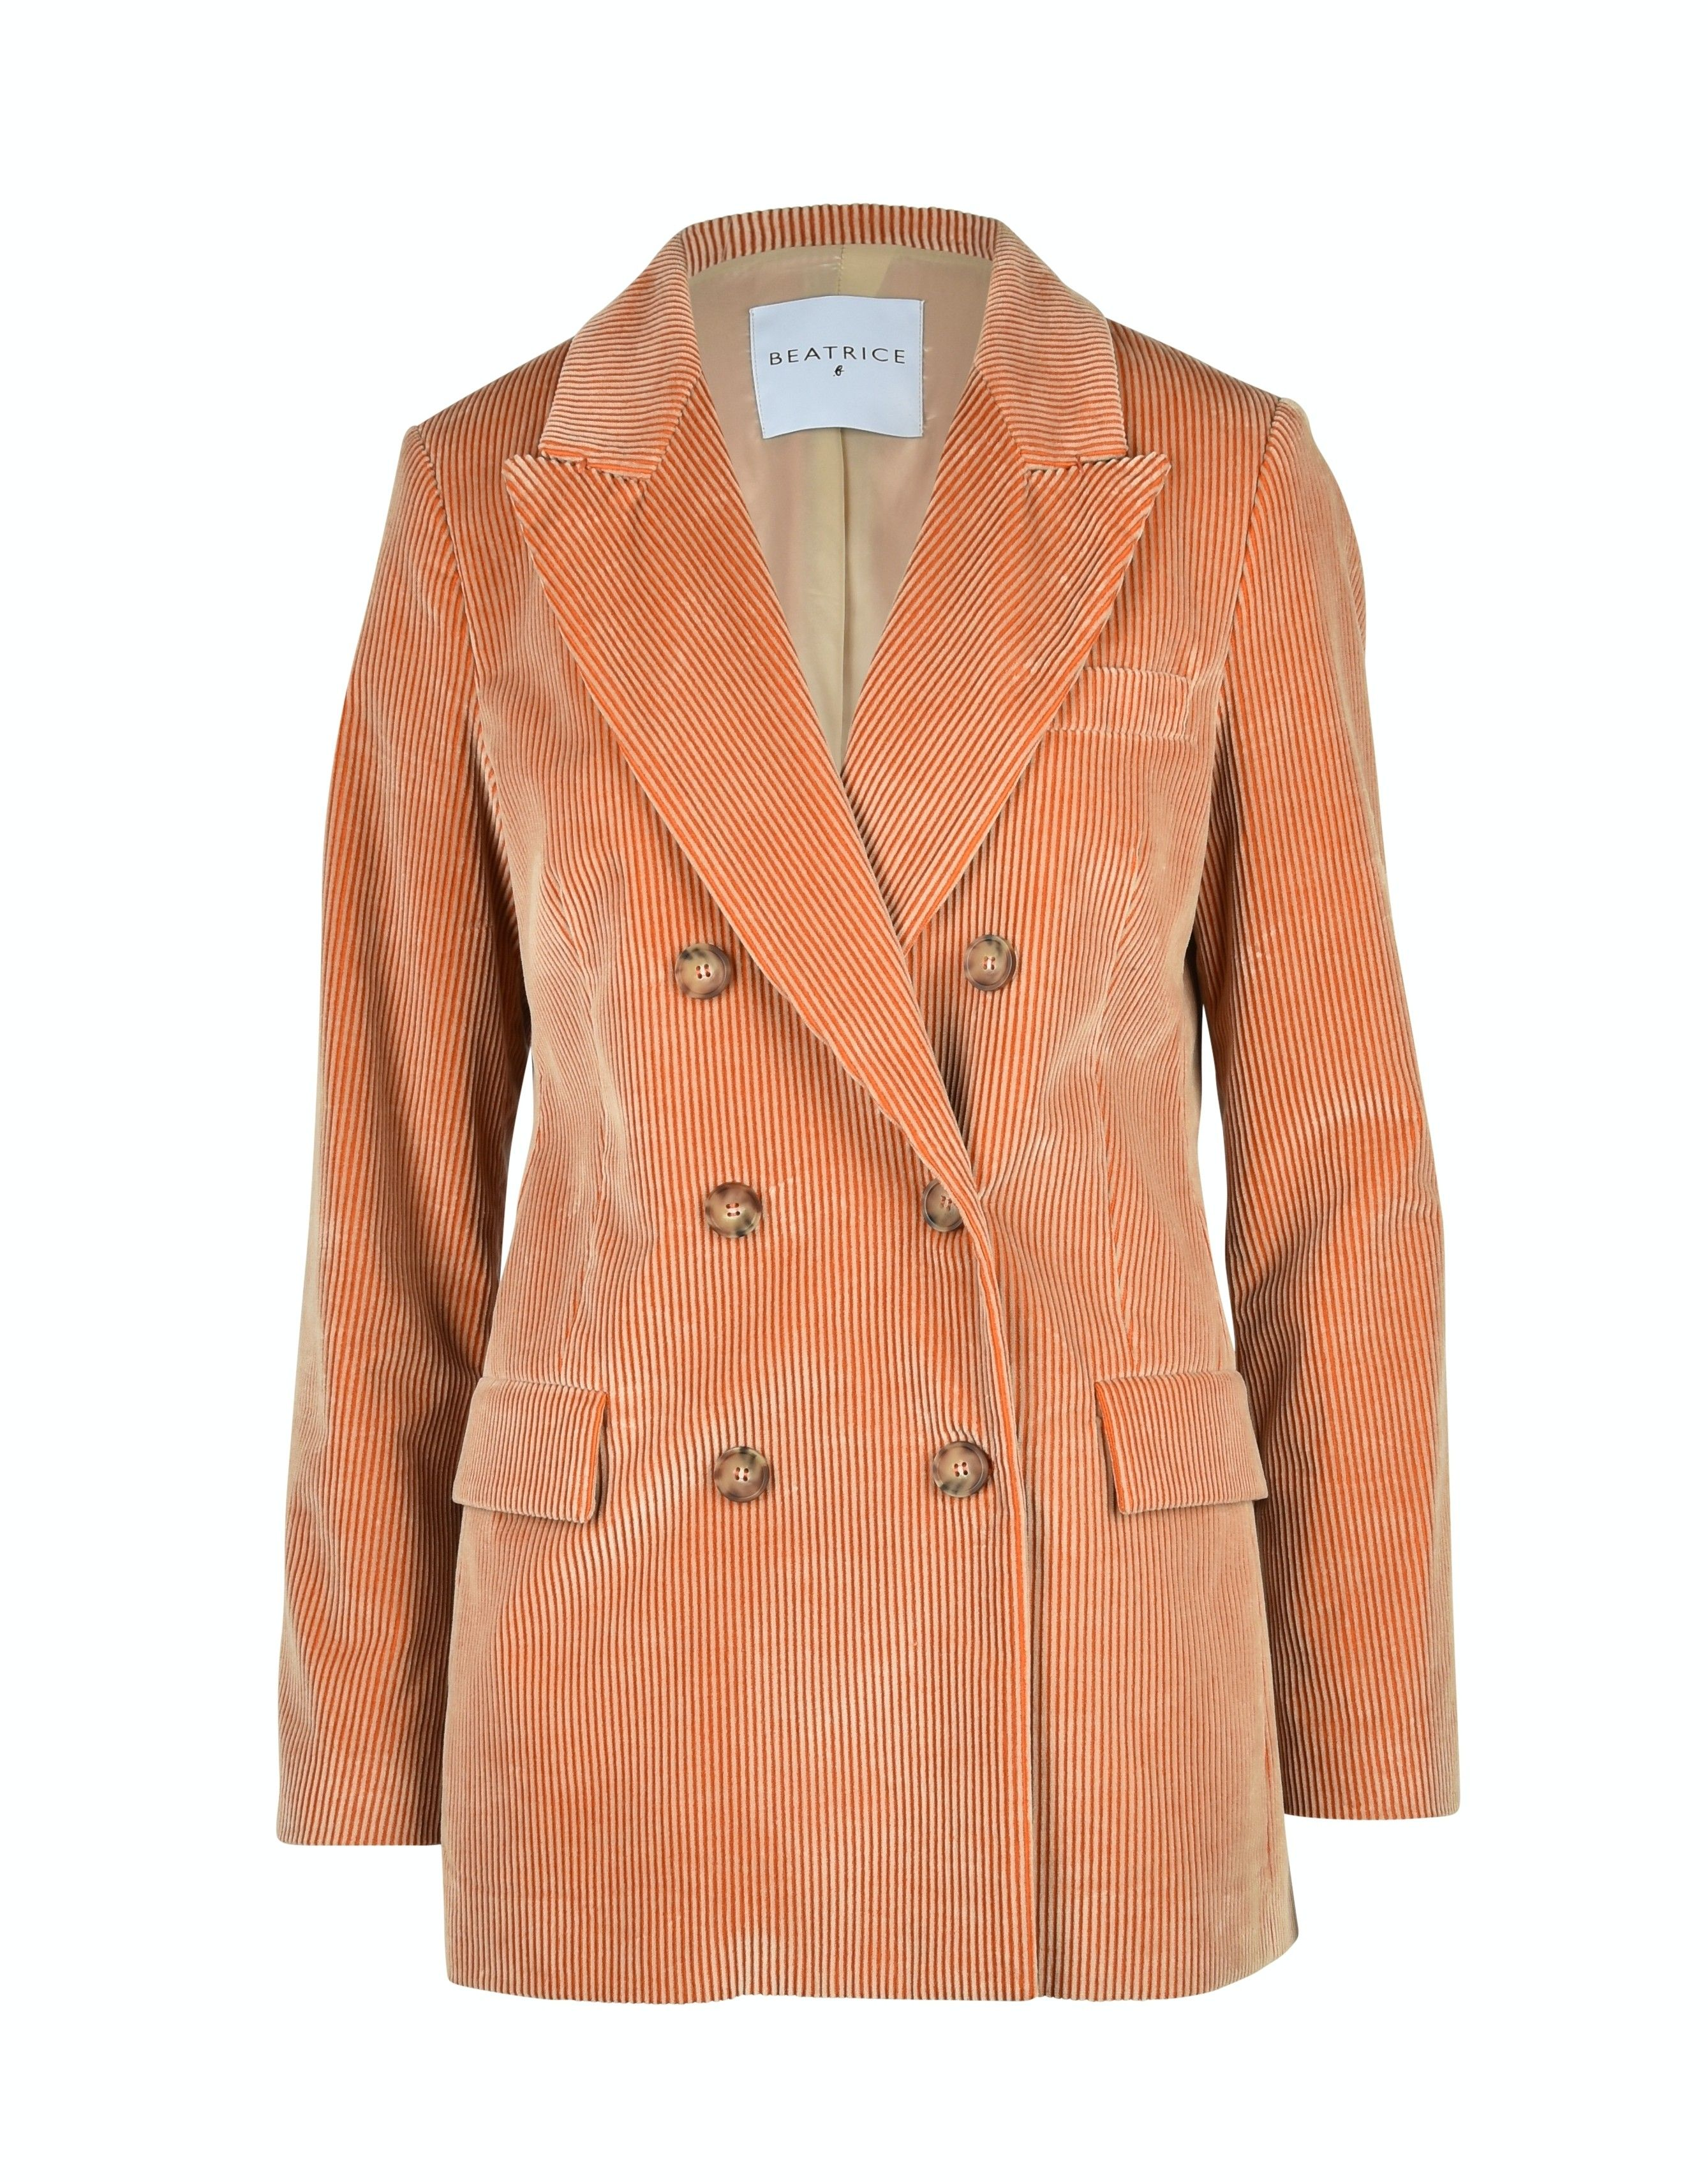 BEATRICE.B - Damen Blazer - 3808 Fabric 50787 B. - Orange/Sand